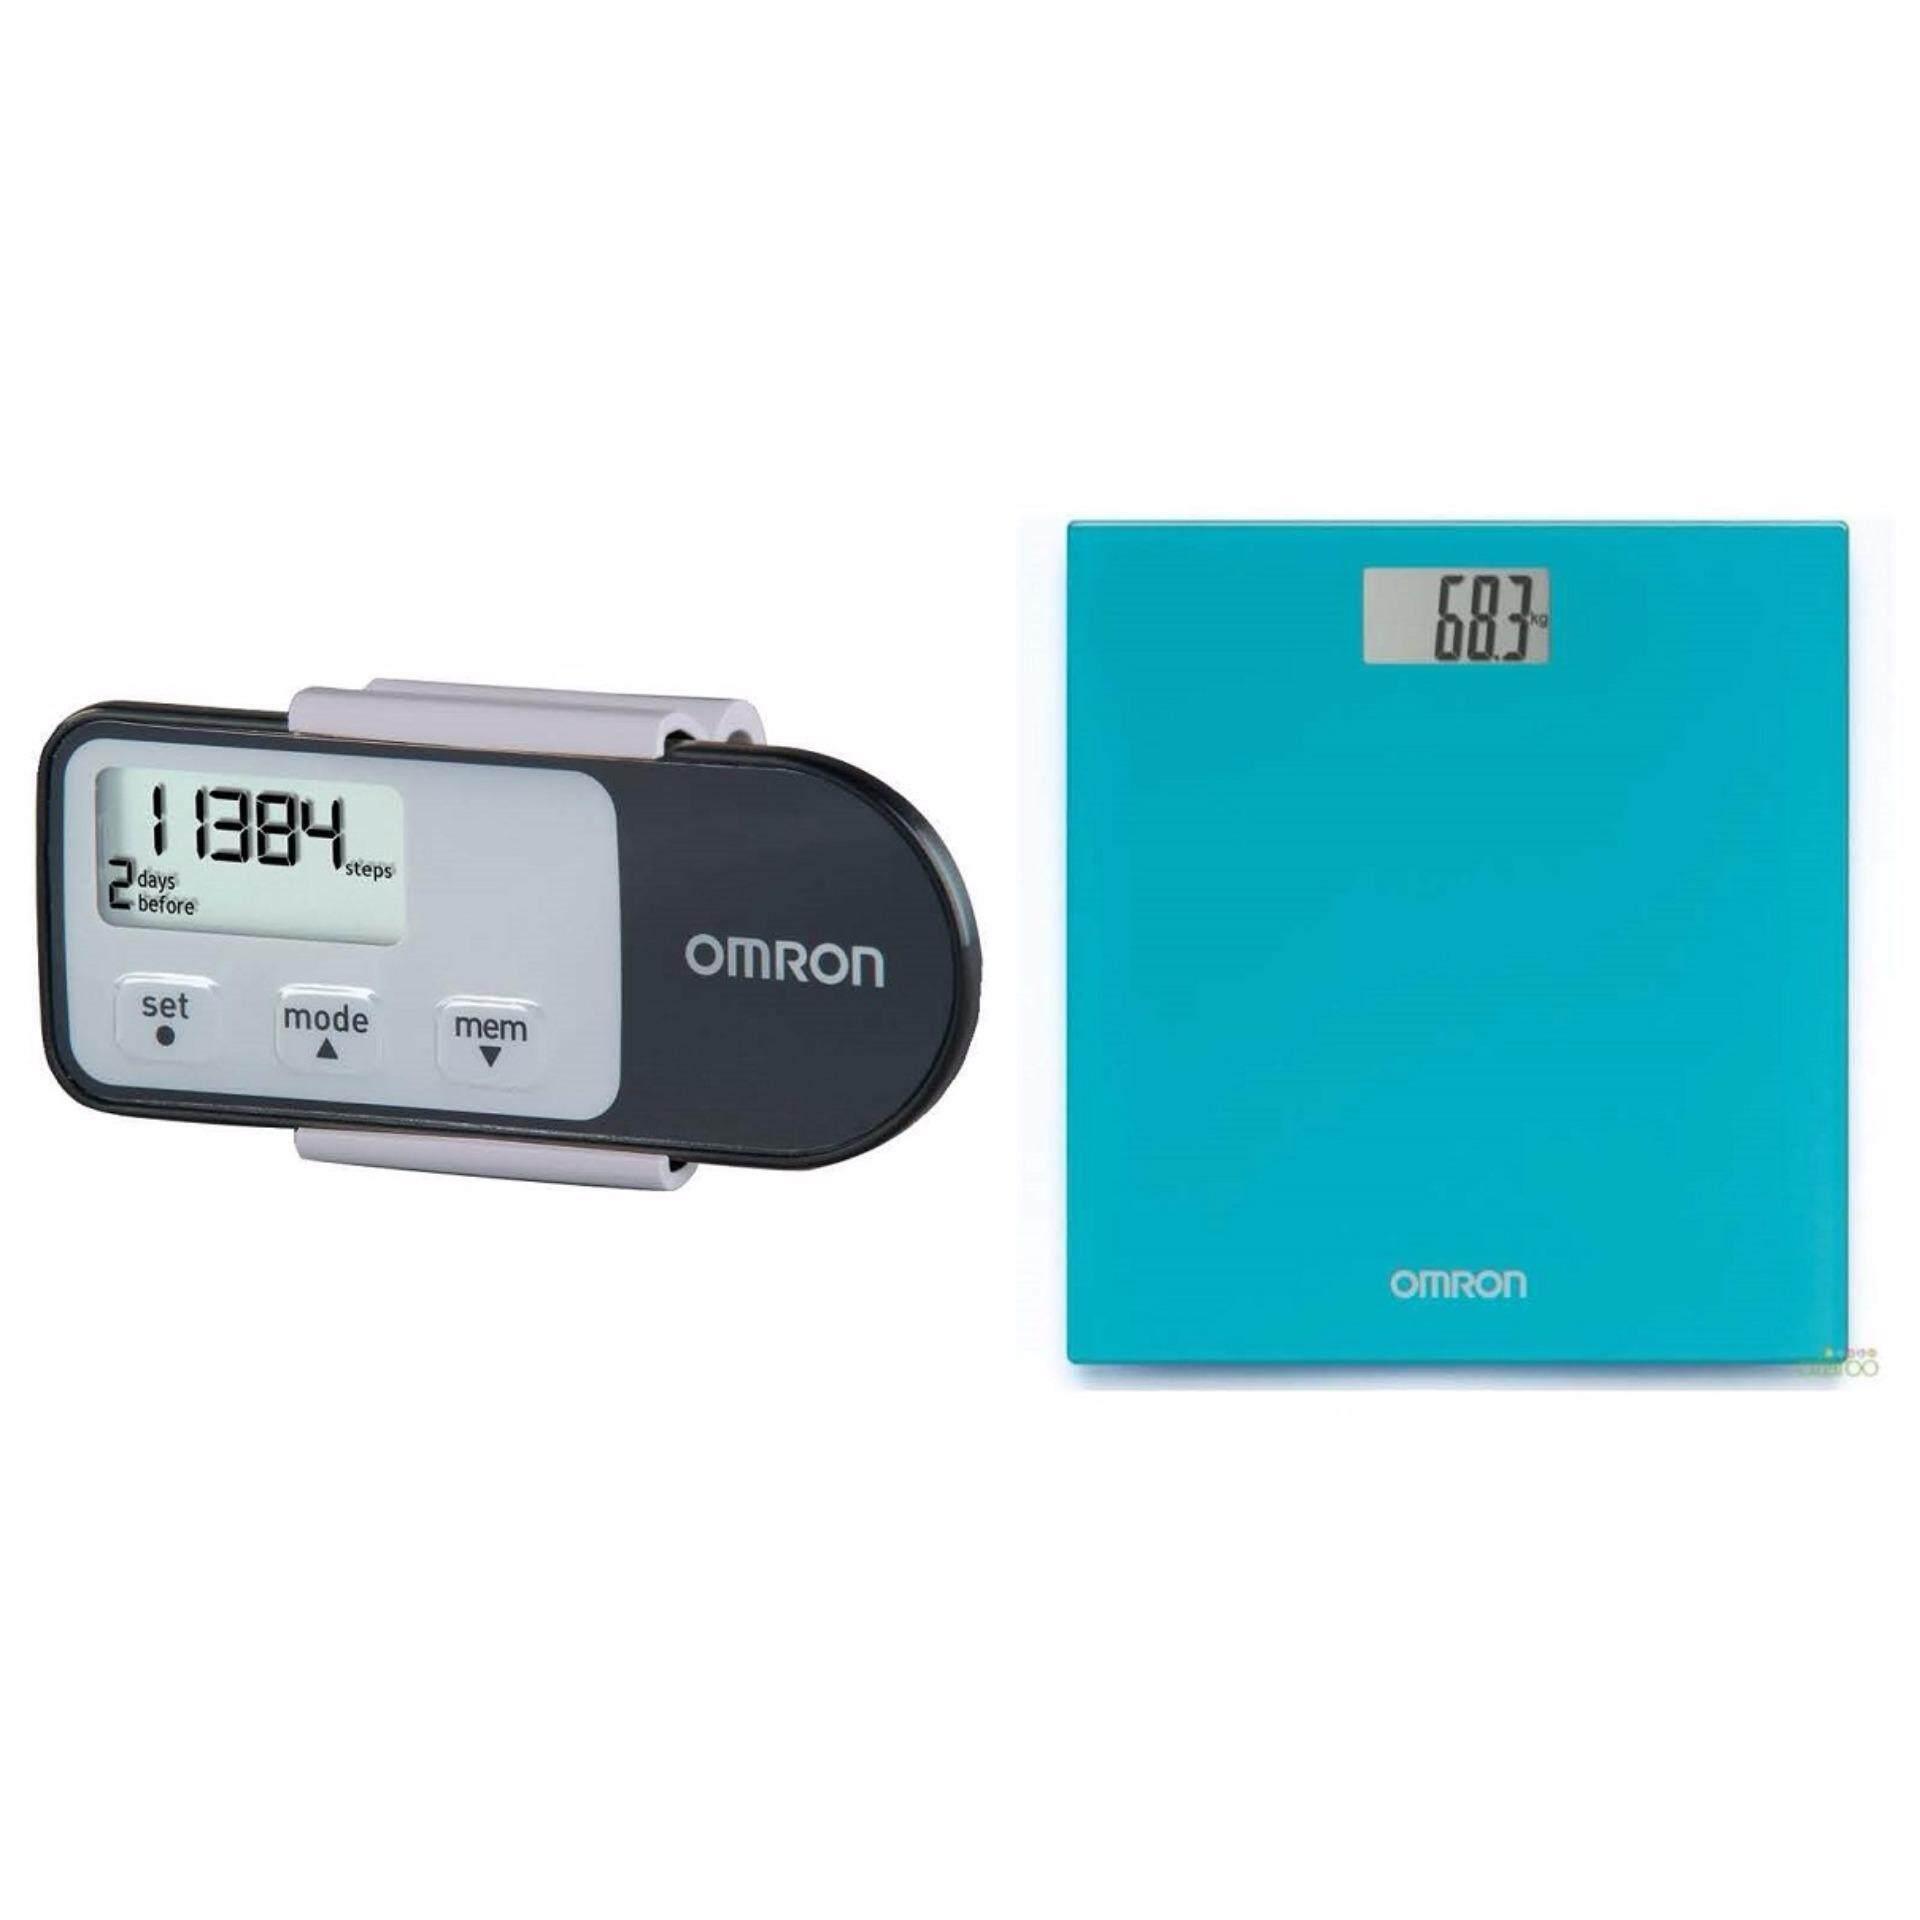 (Original) Omron HJ-321 Tri-Axis Pedometer Black+ HN289 Weighing Scale Ocean Blue (Warranty One Year)